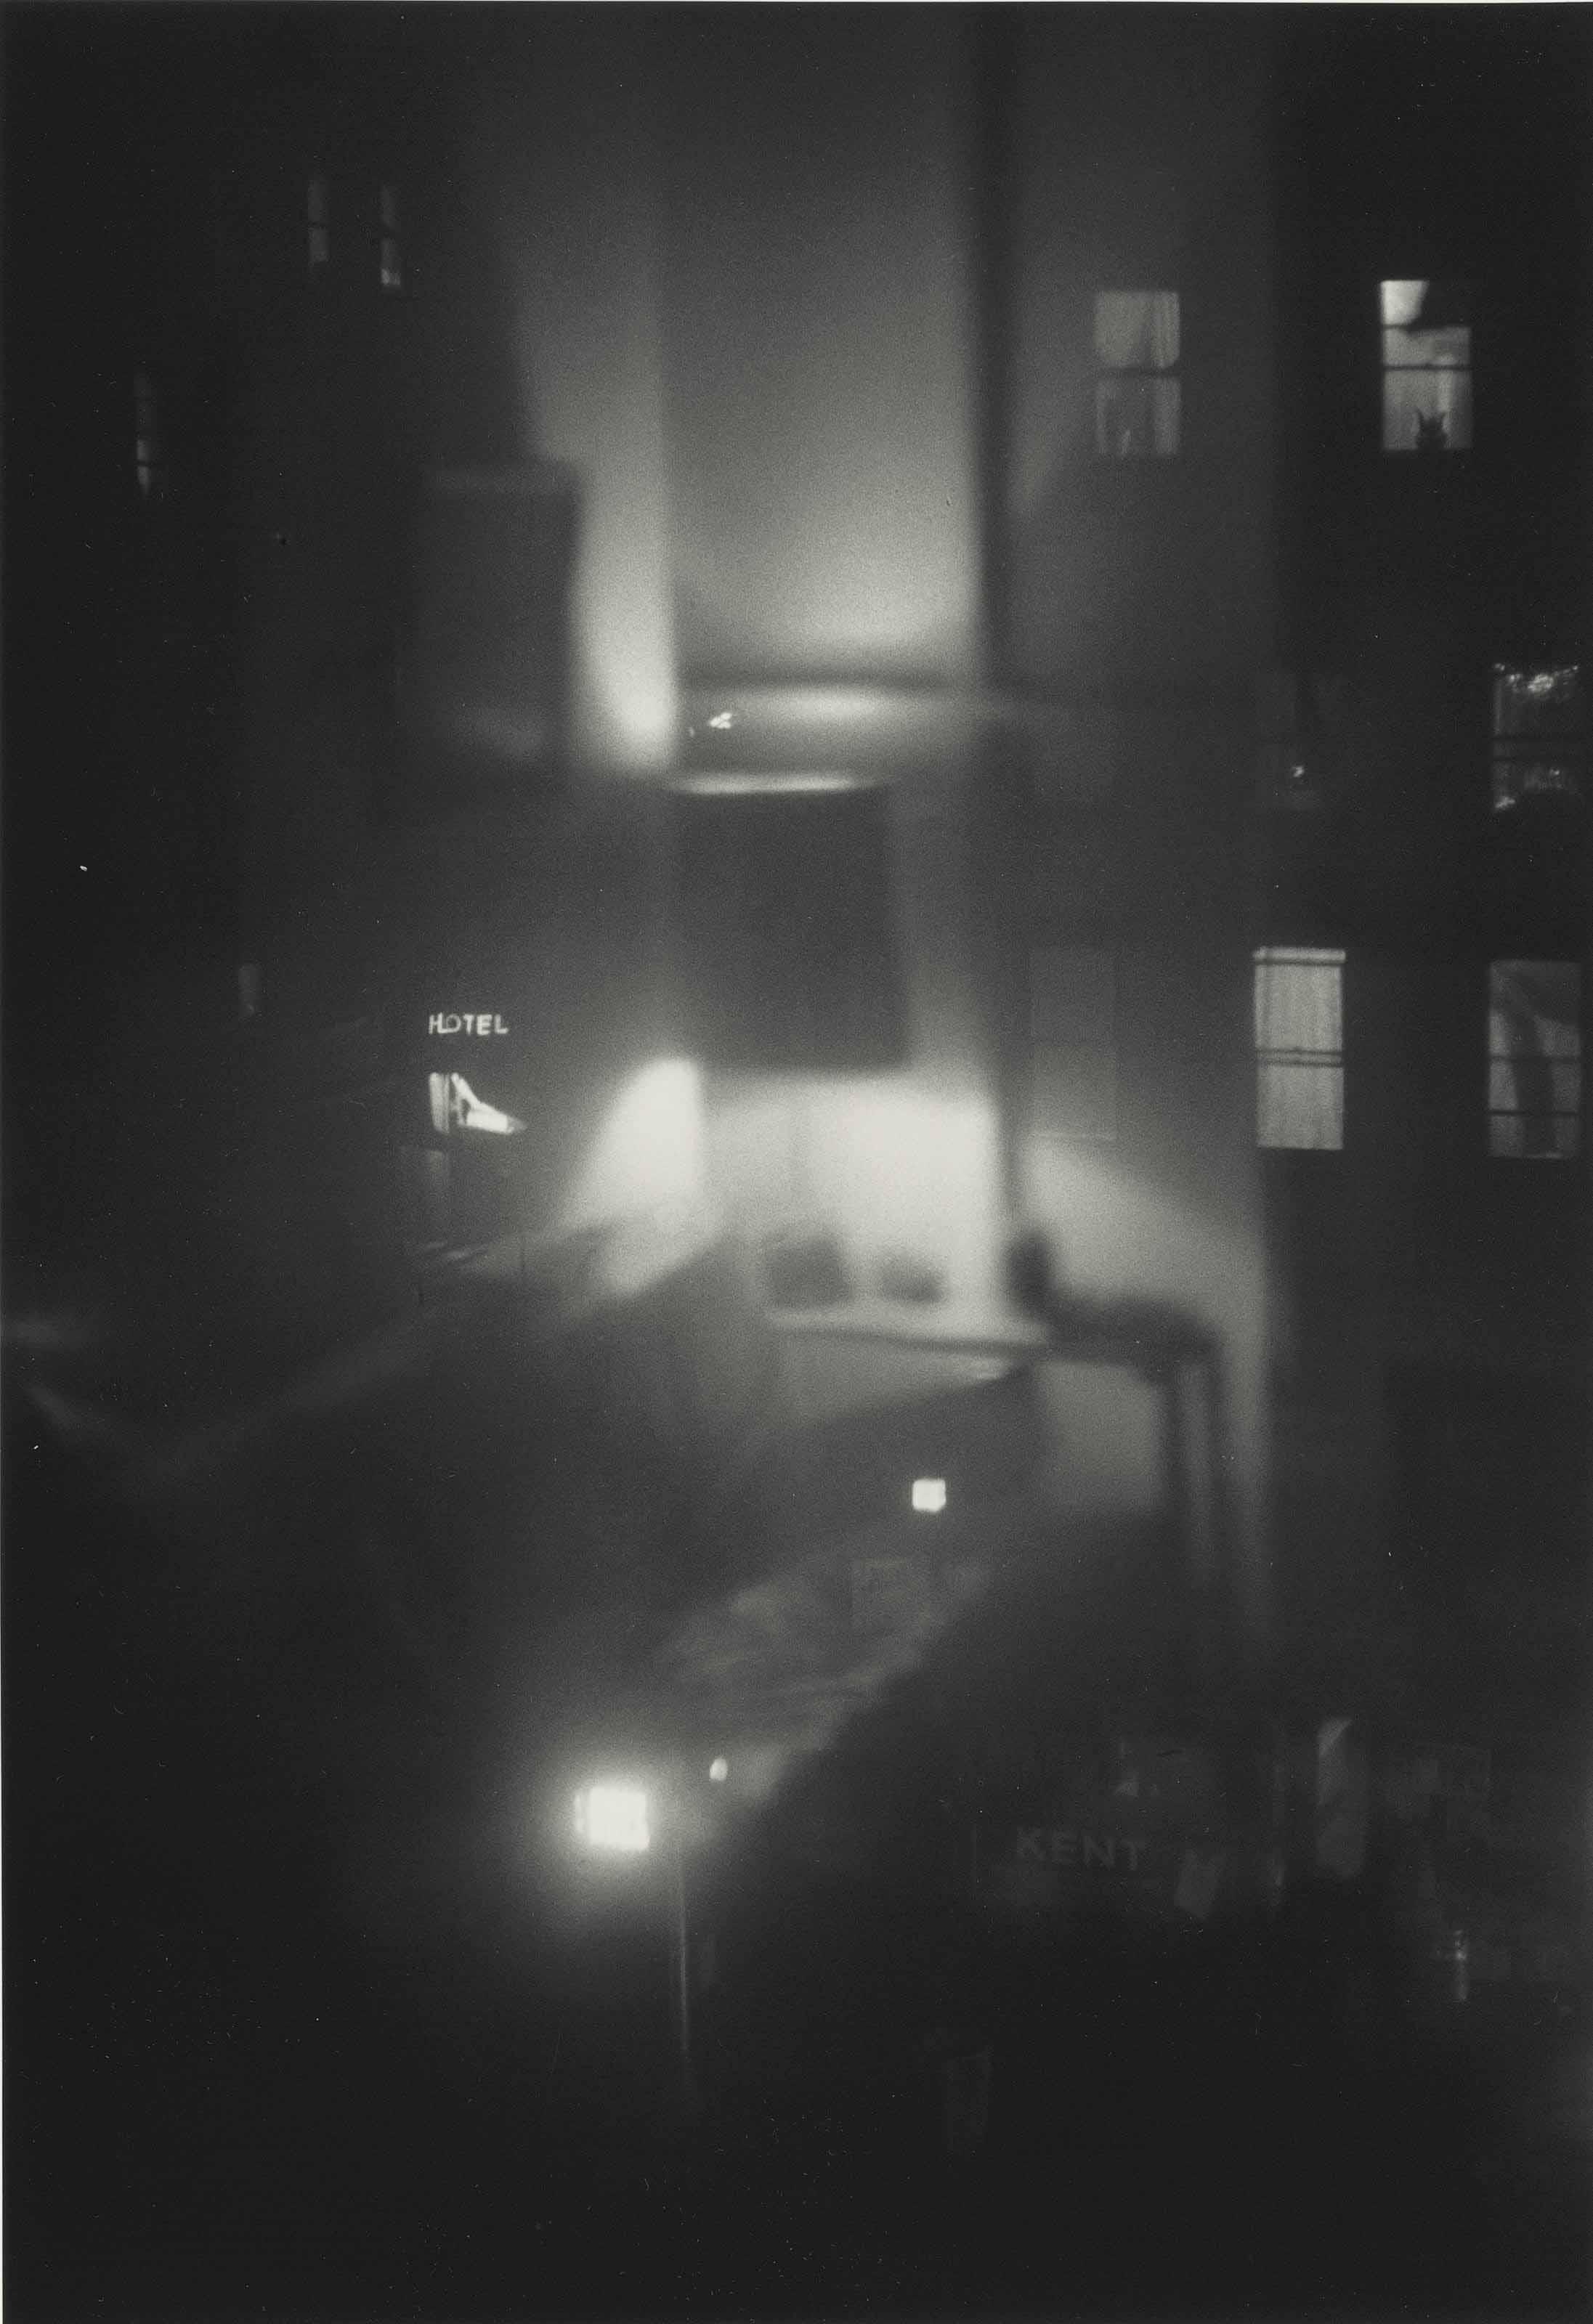 Hotel, New York, 1962